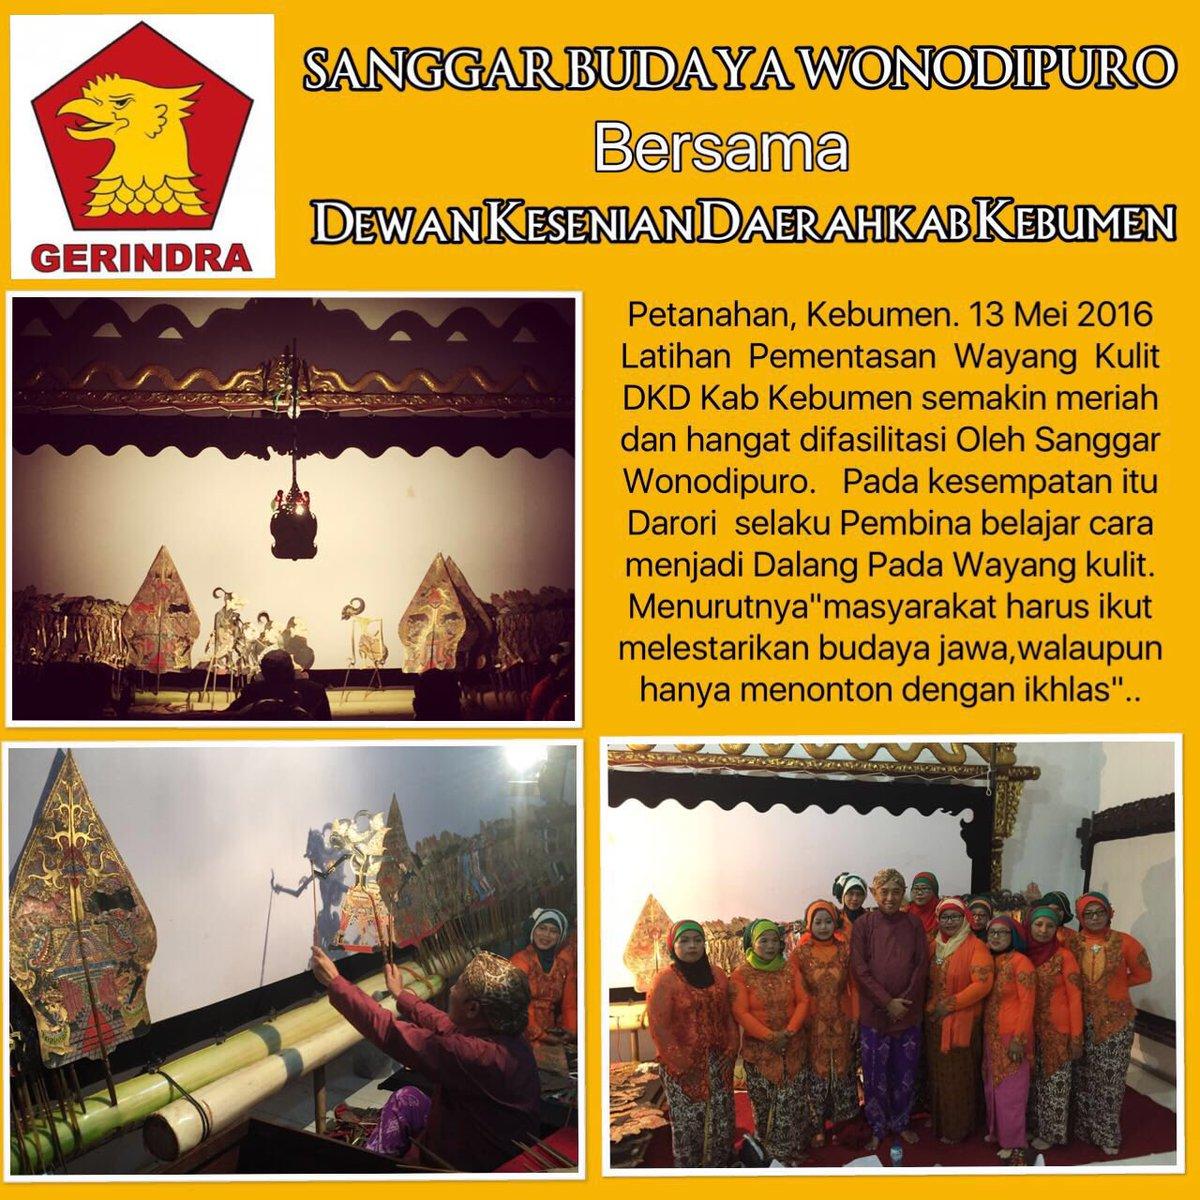 #anggotadprri #gerindra #komisi4 #gerindraindonesia #daroriwonodipuropic.twitter.com/aPK2Bfo2ea